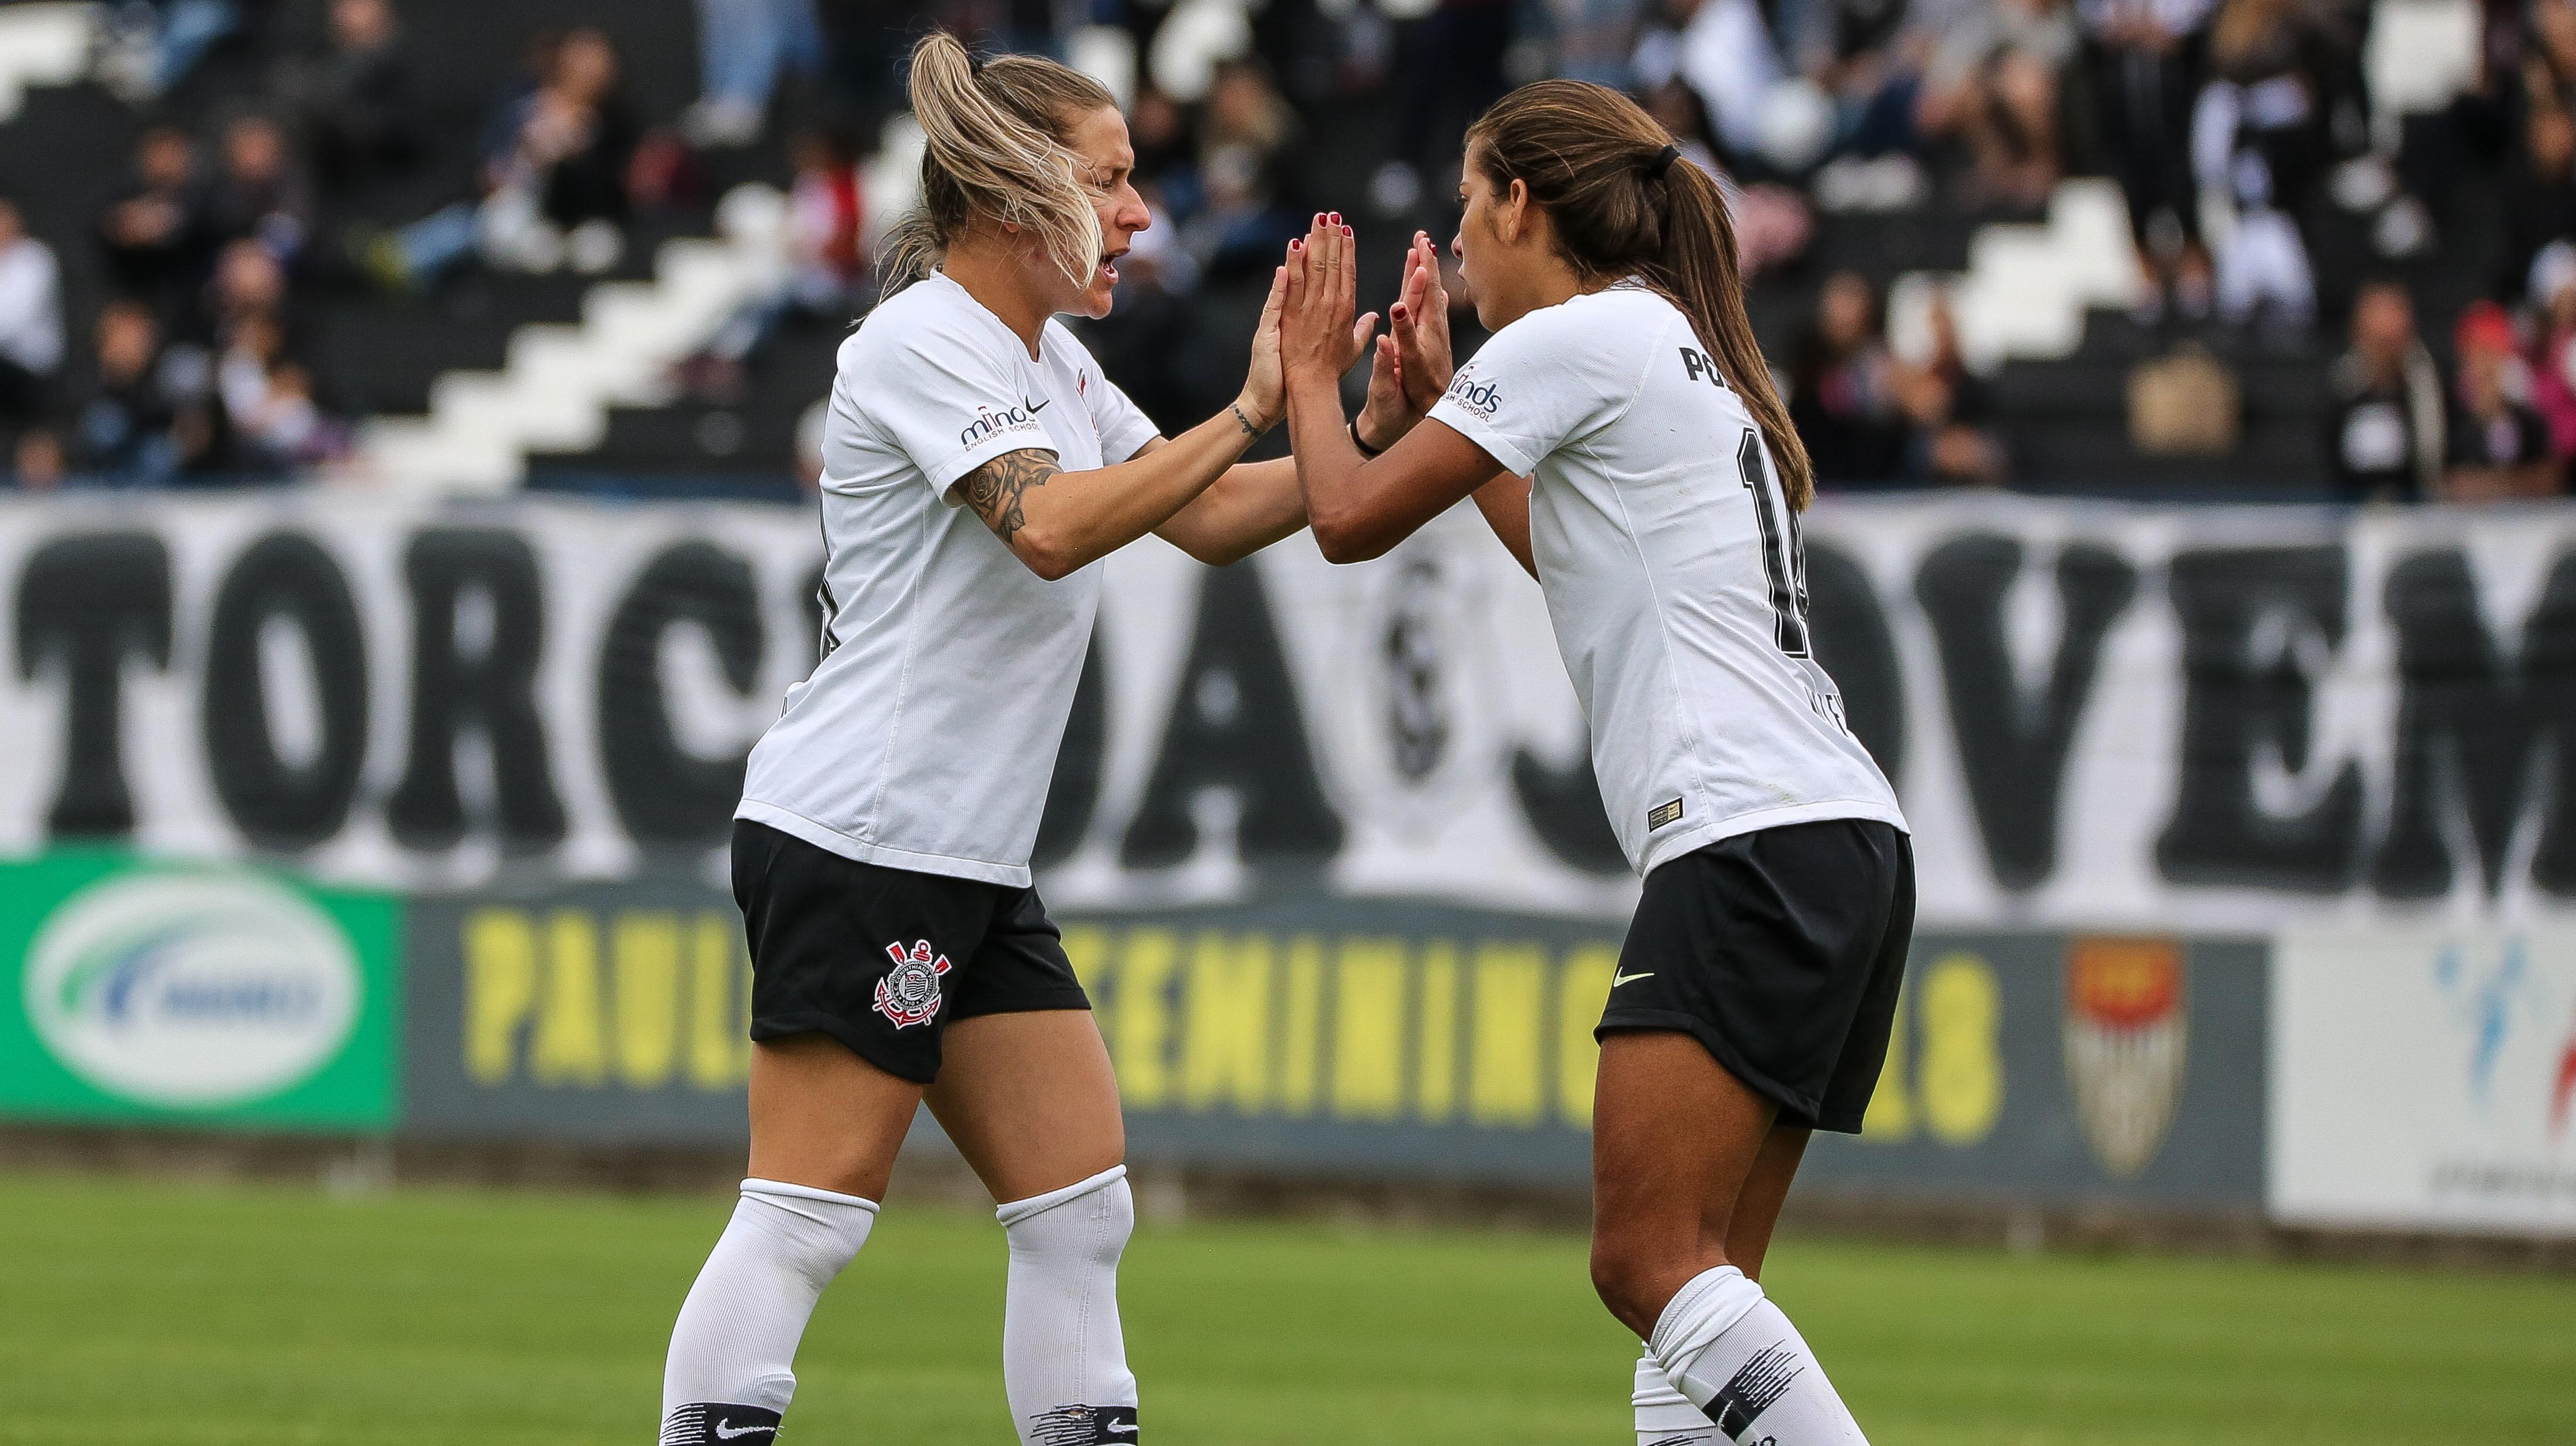 Paulista Feminino: Corinthians vs Juventus